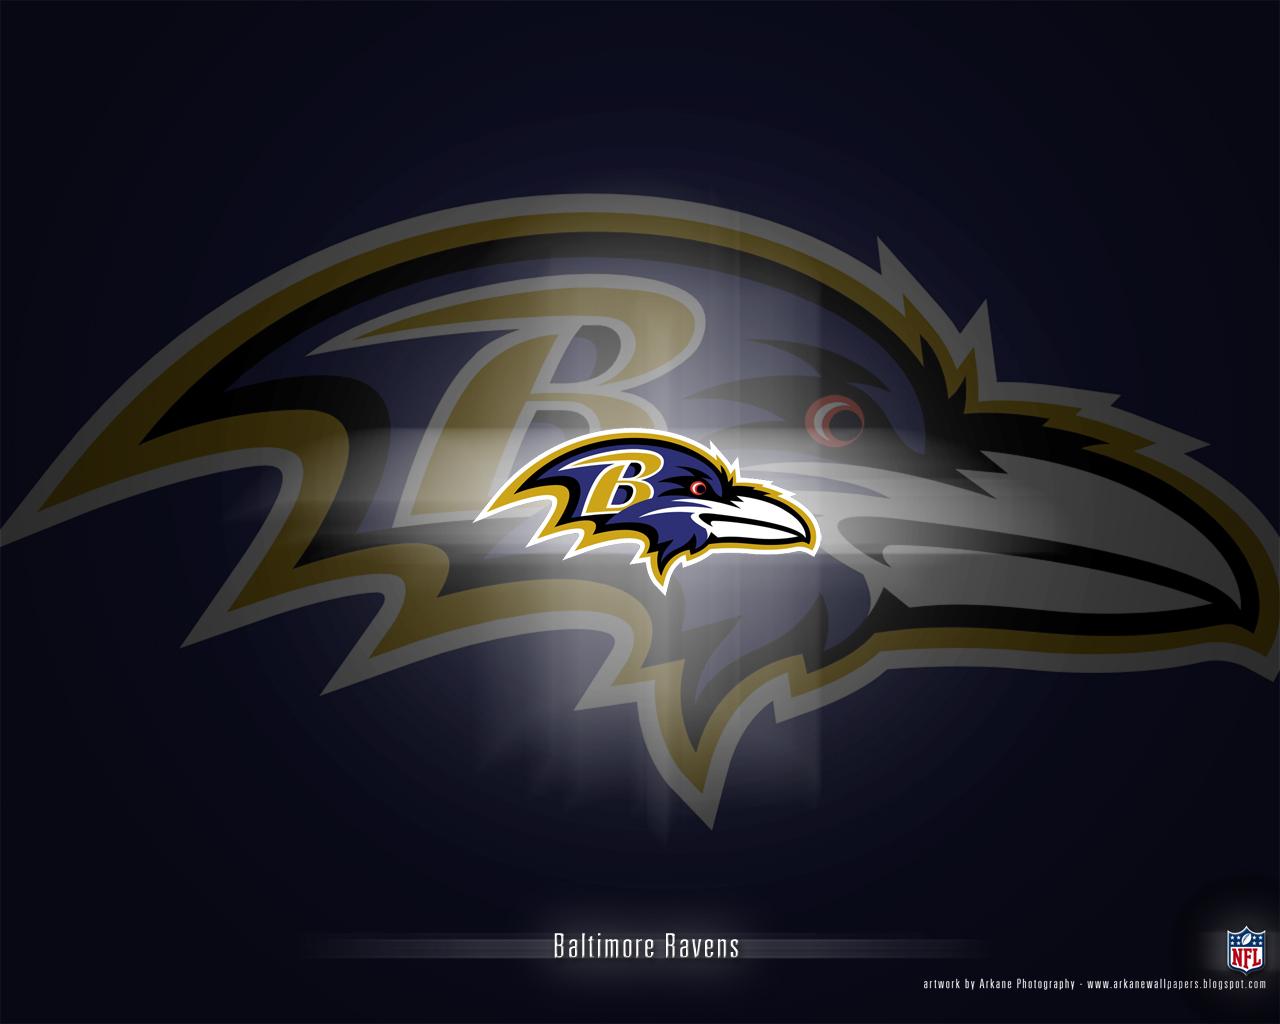 Wallpapers Hd Baltimore Ravens 960 X 854 141 Kb Jpeg HD Wallpapers 1280x1024